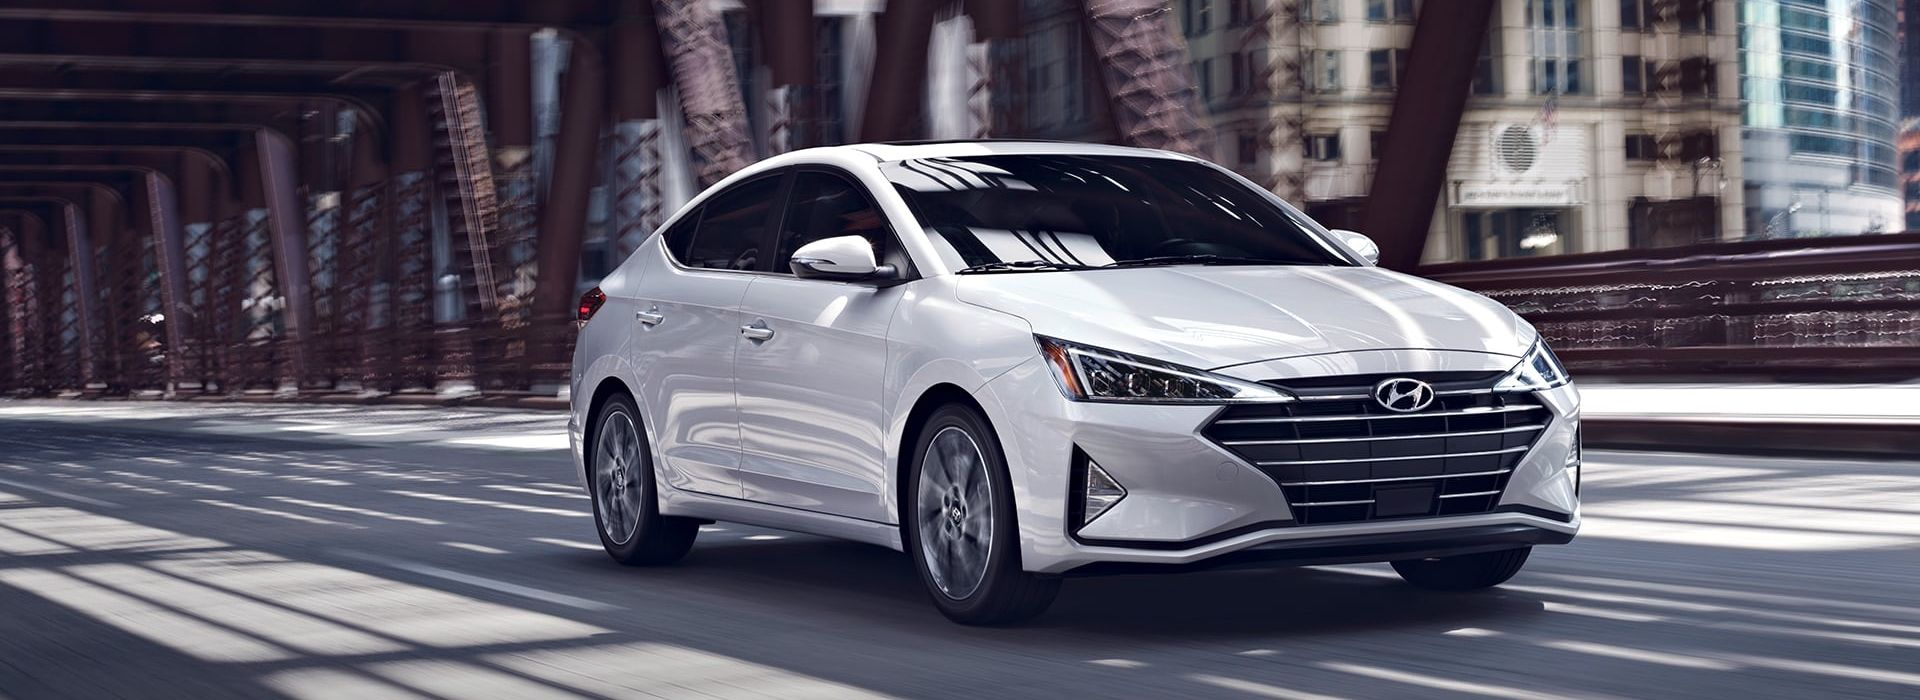 2019 Hyundai Elantra Leasing near Manassas, VA